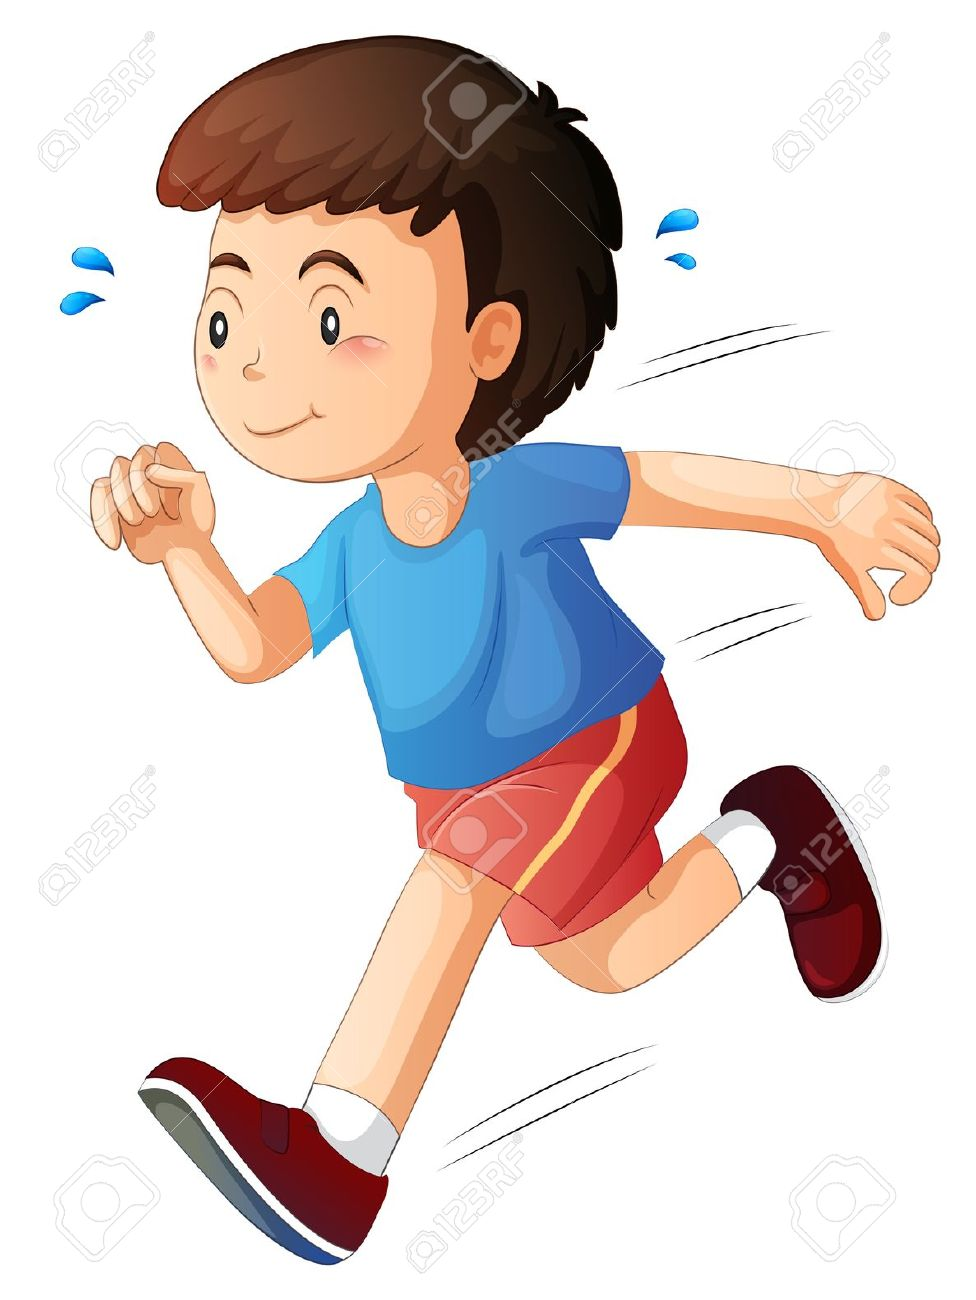 Boy running fast clipart - .